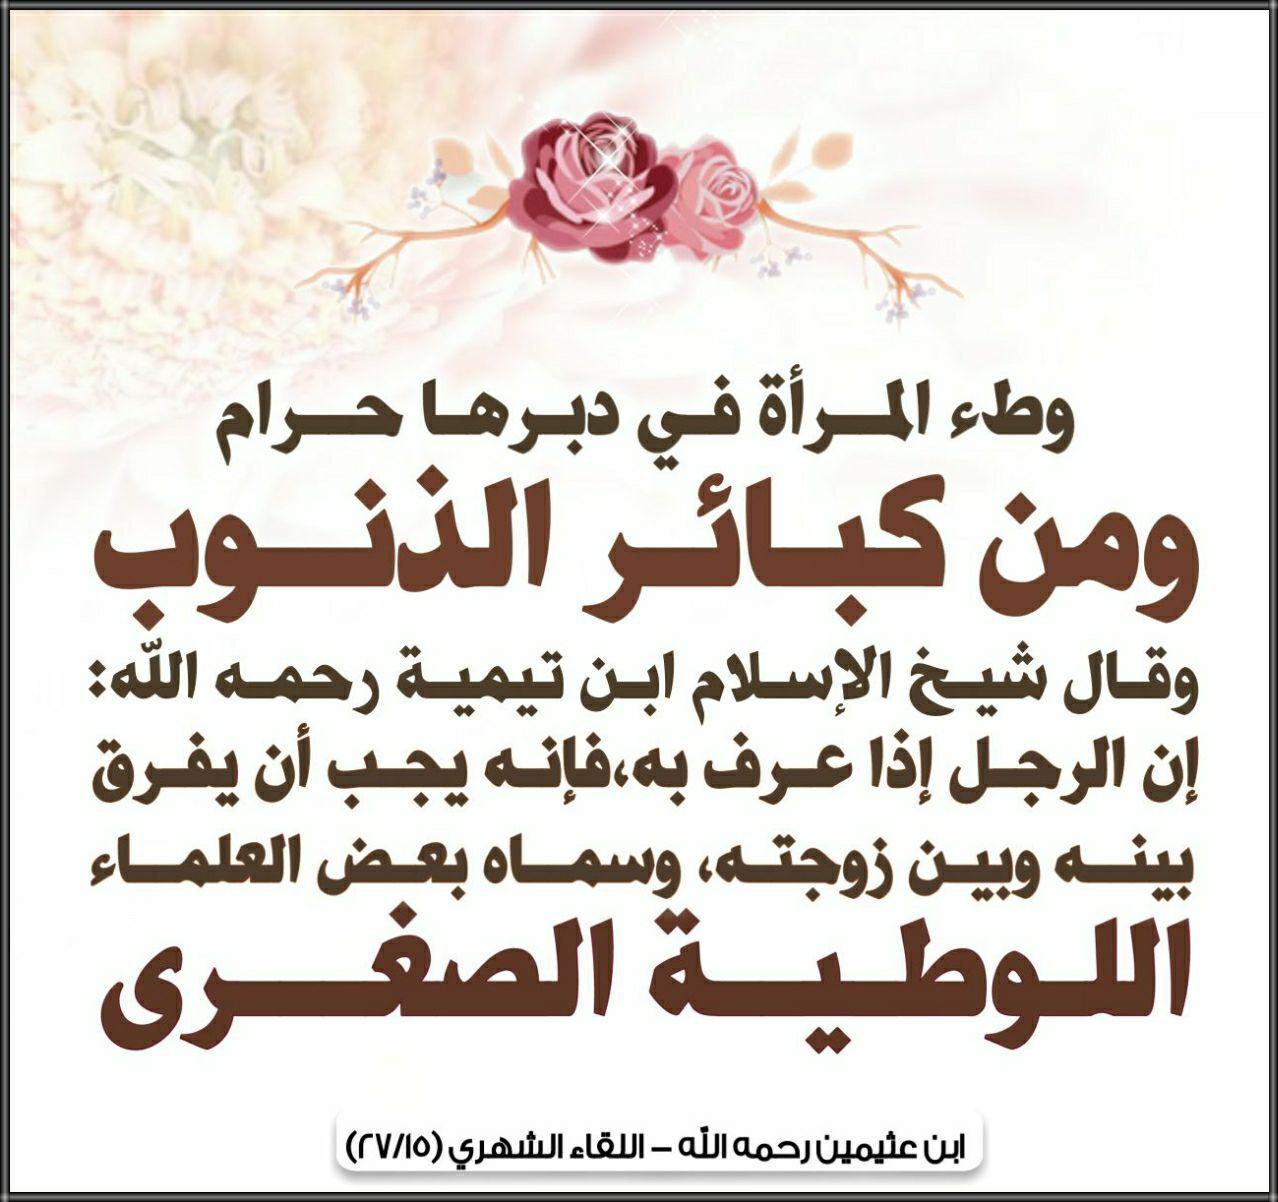 Pin By Aida Didis On أقوال الصحابة والعلماء Arabic Calligraphy Calligraphy Sal